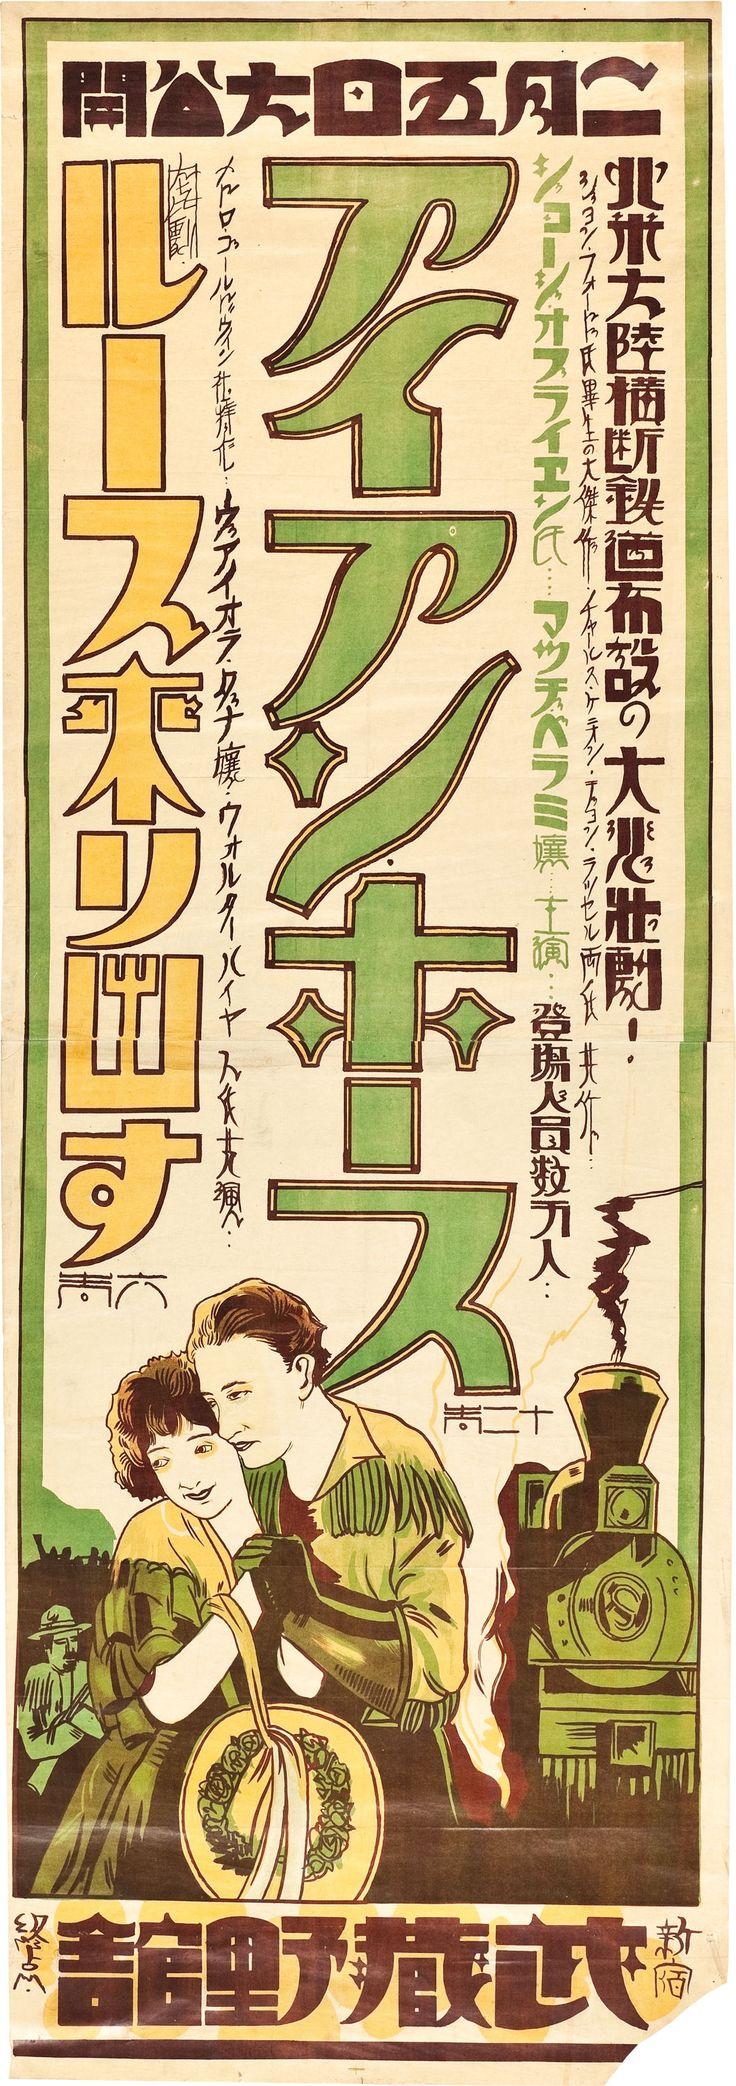 The Iron Horse (John Ford, 1924) Japanese design